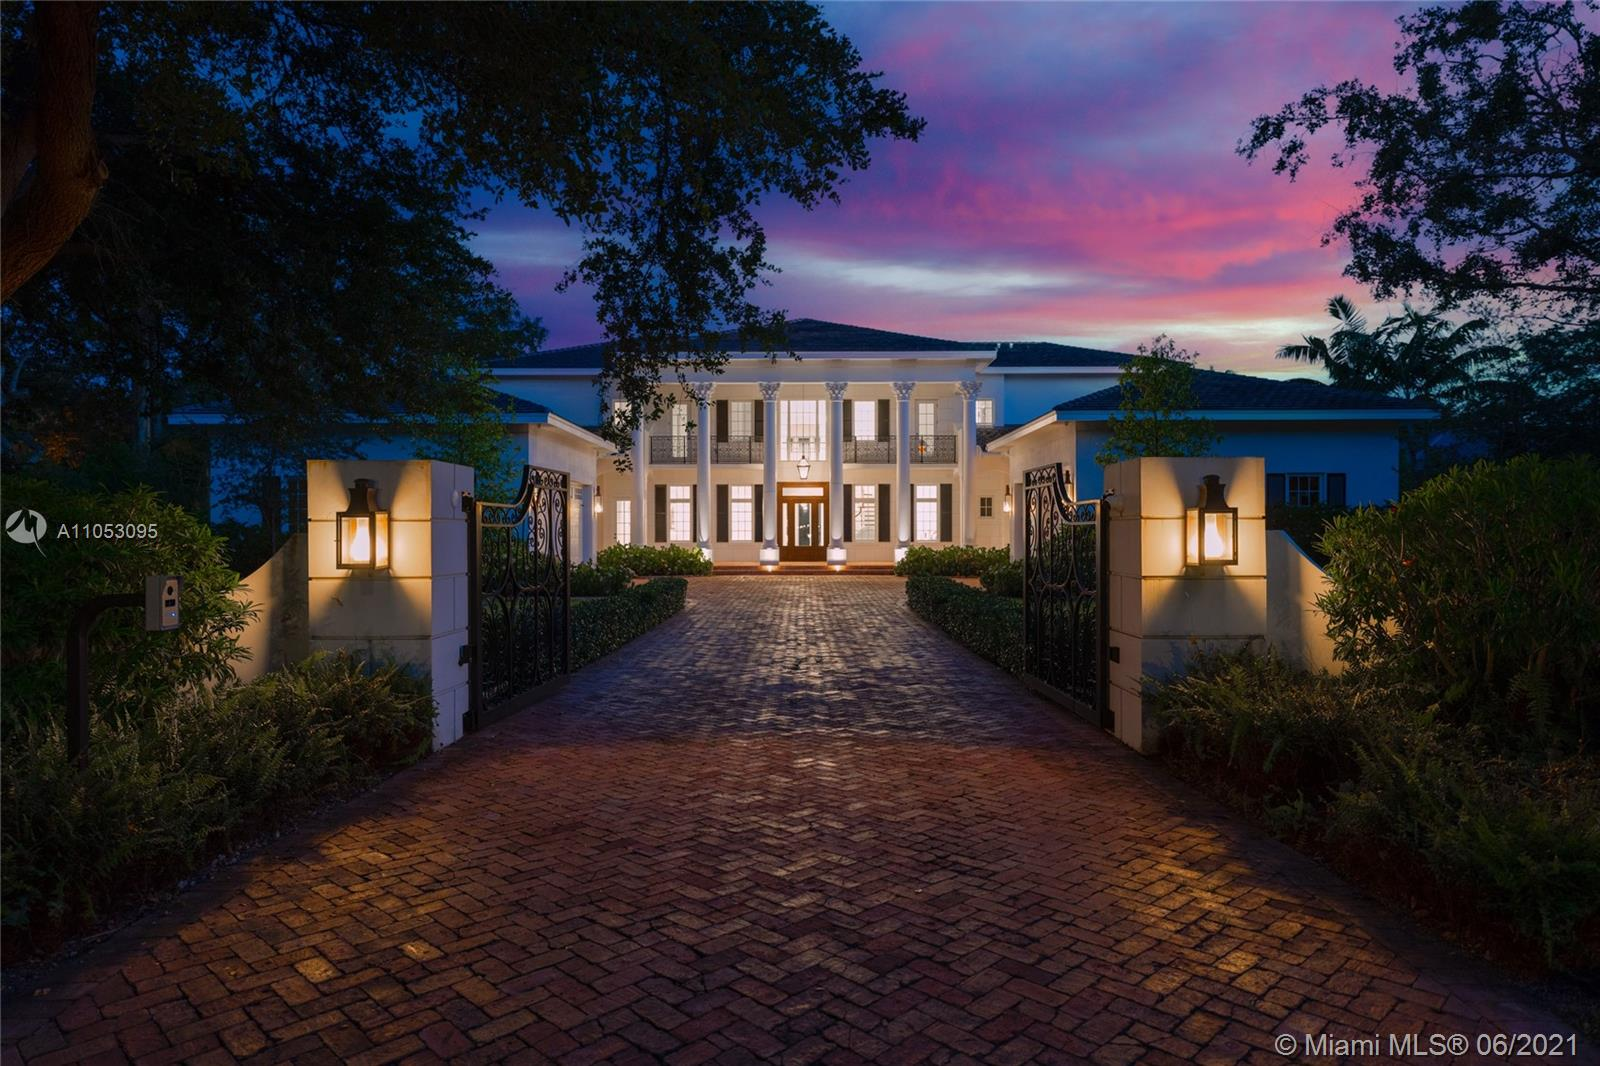 Helms Country Estates - 6650 SW 106th St, Pinecrest, FL 33156